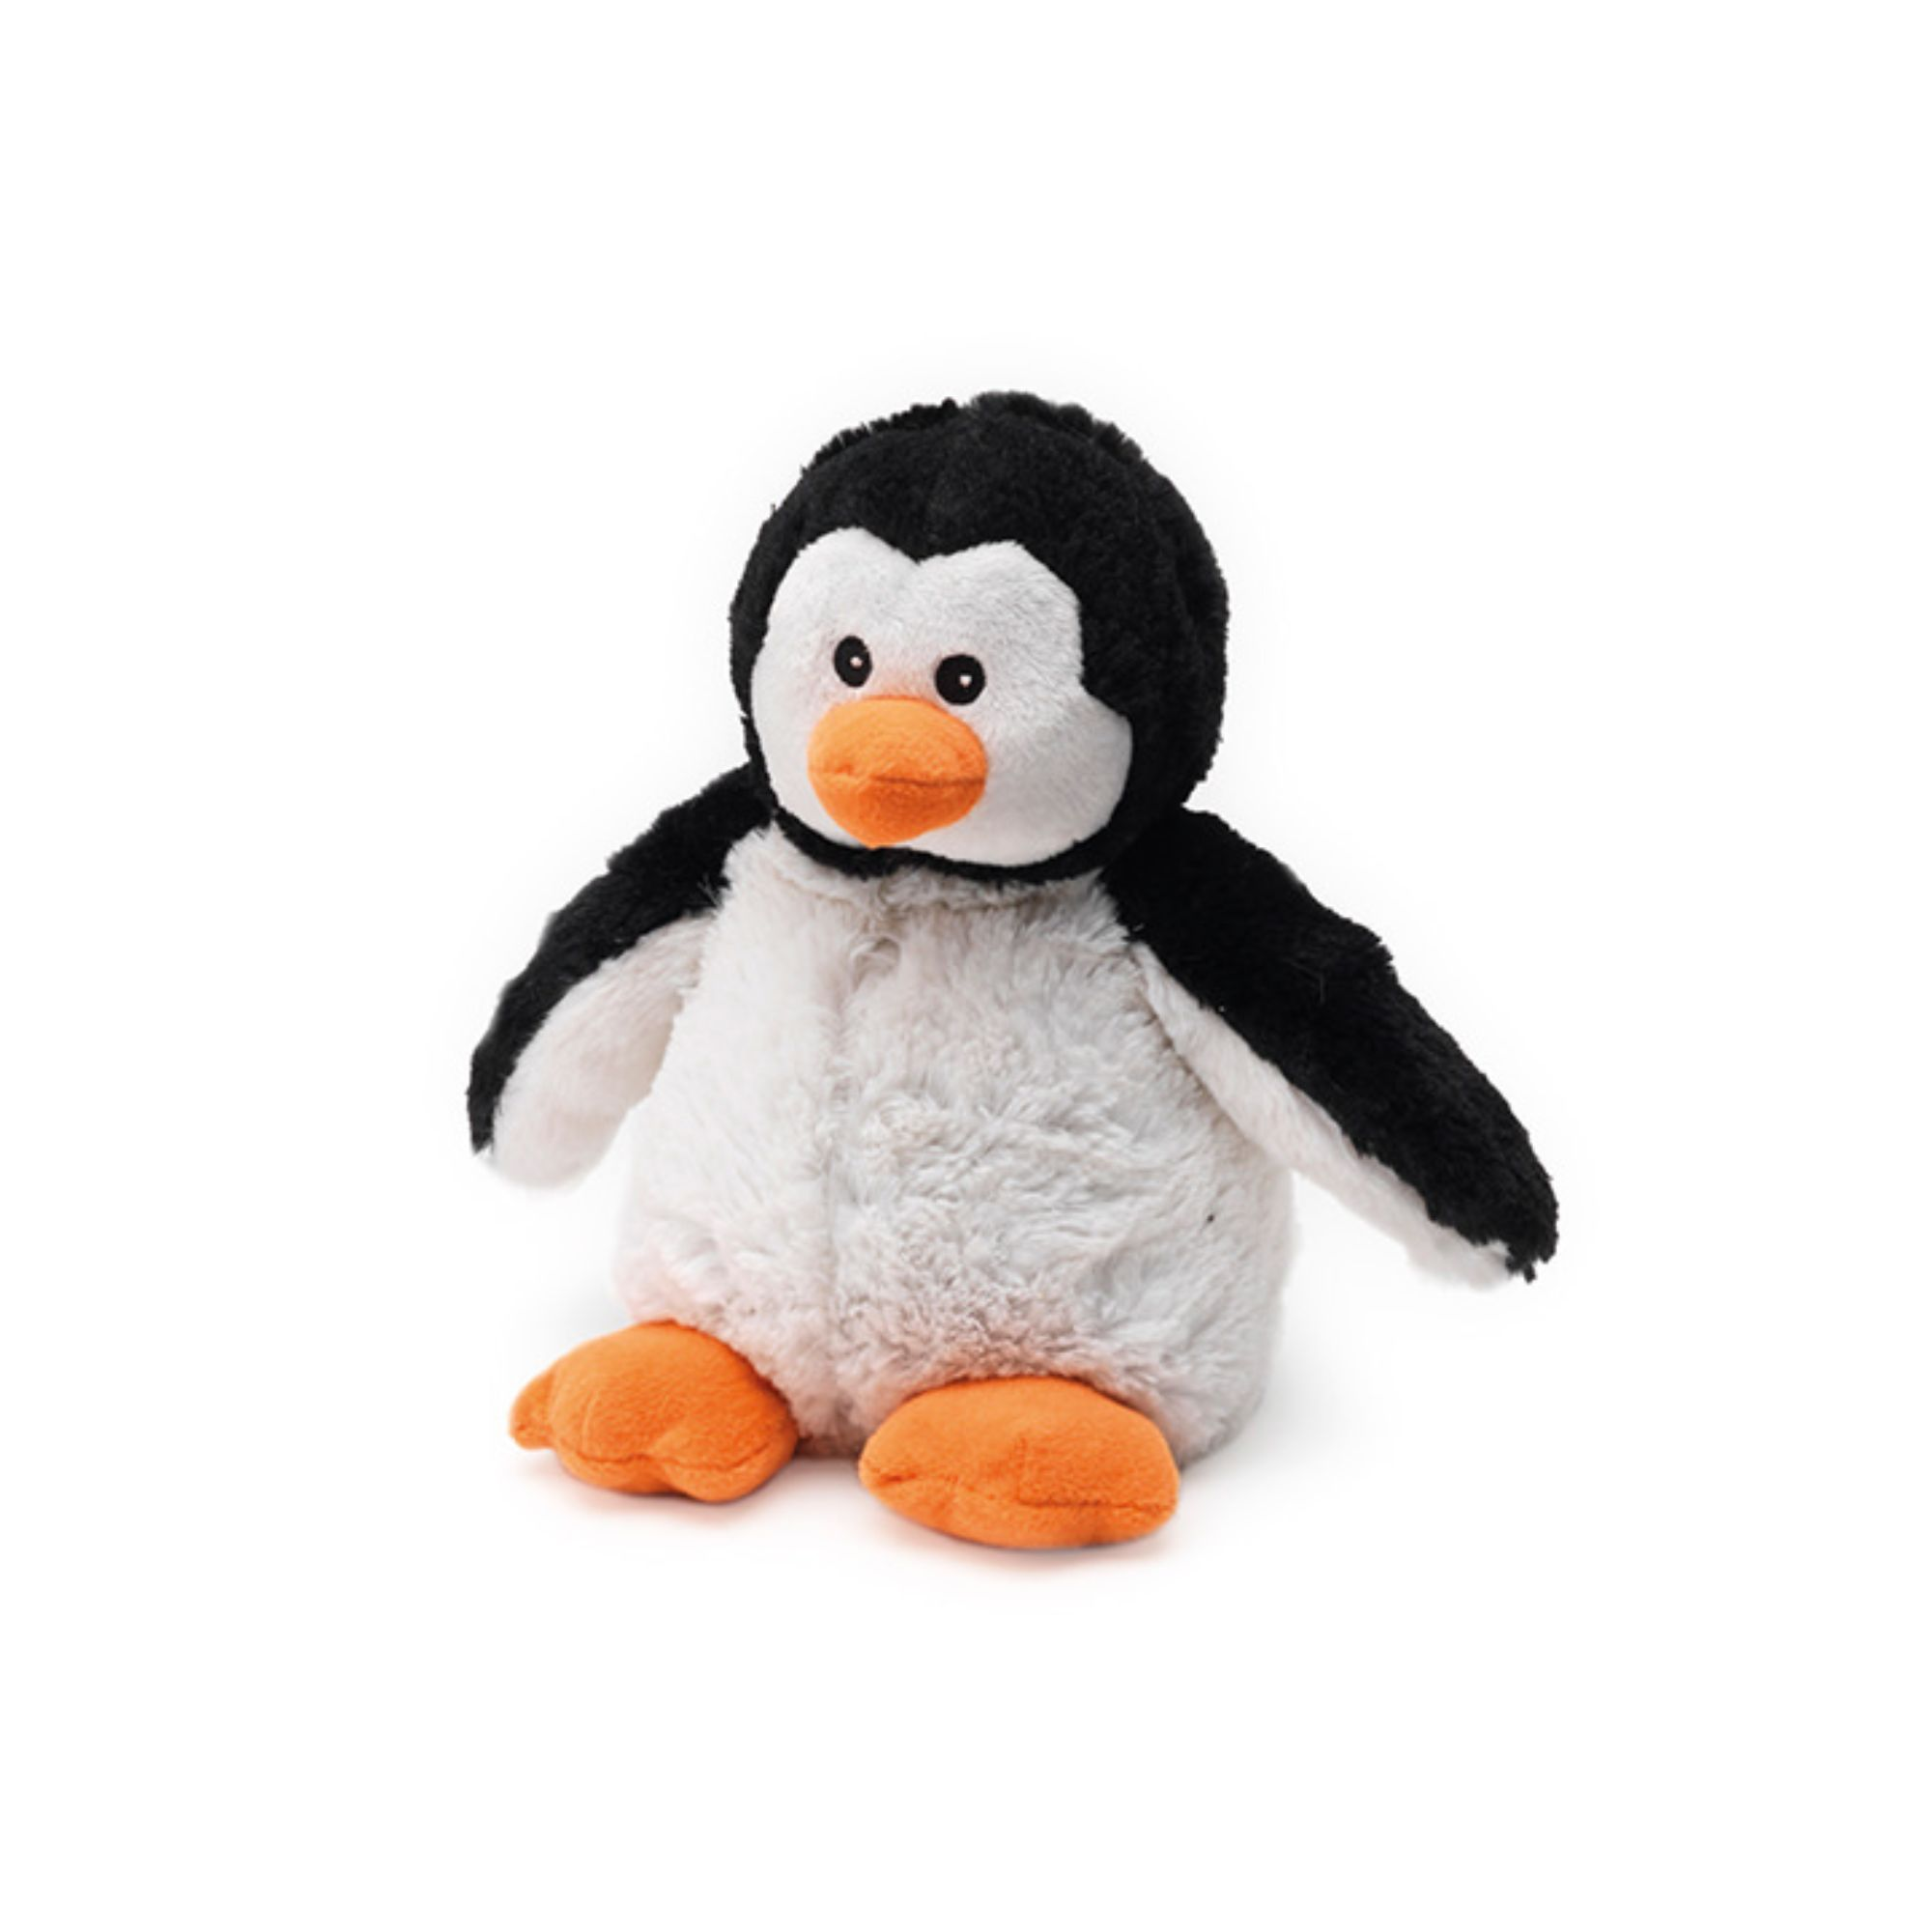 "13"" Black and White Microwavable Plush Penguin Stuffed"